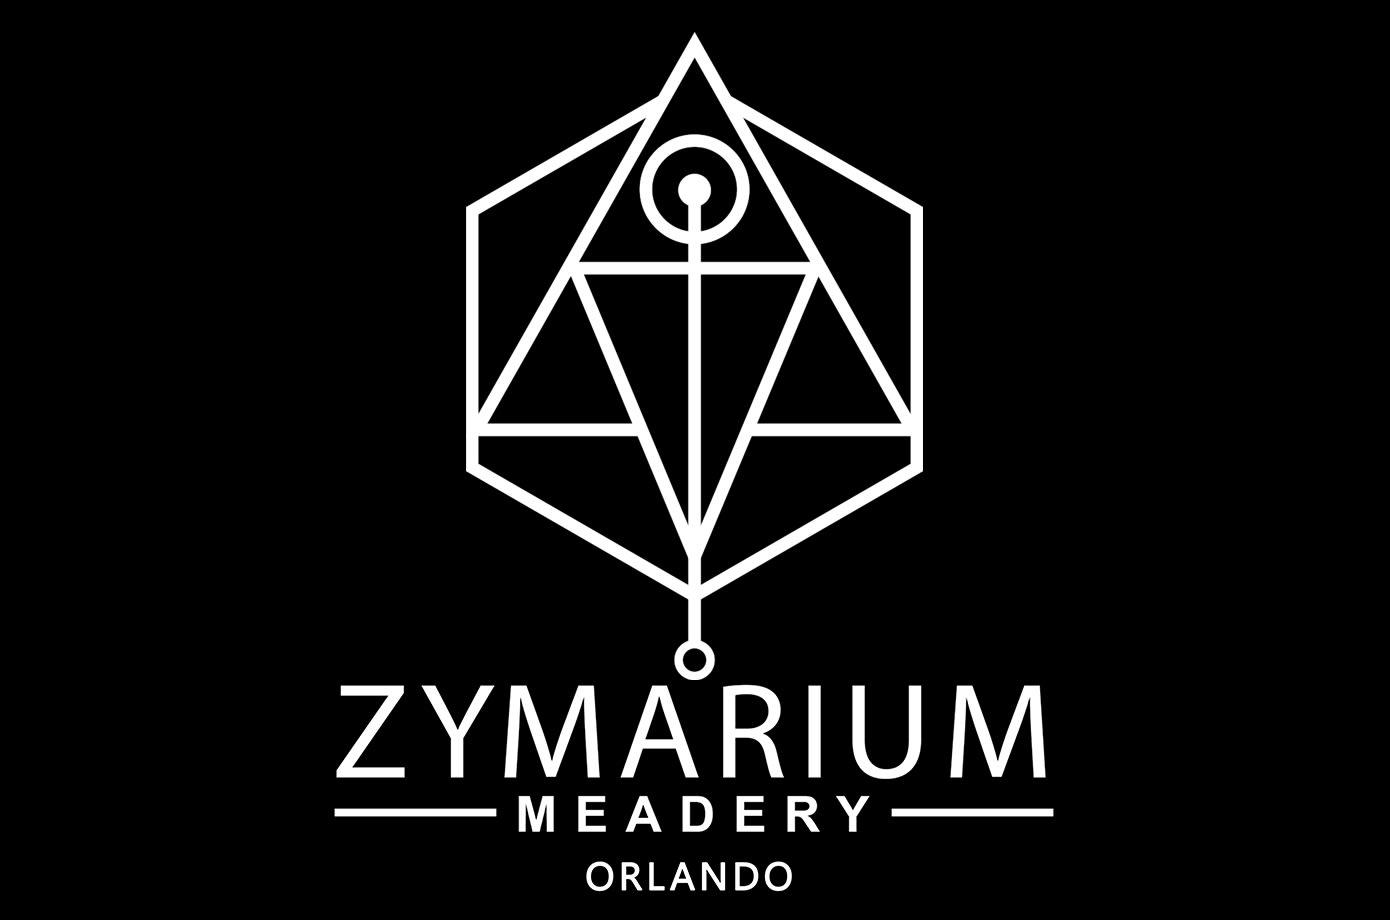 Zymarium Meadery logo